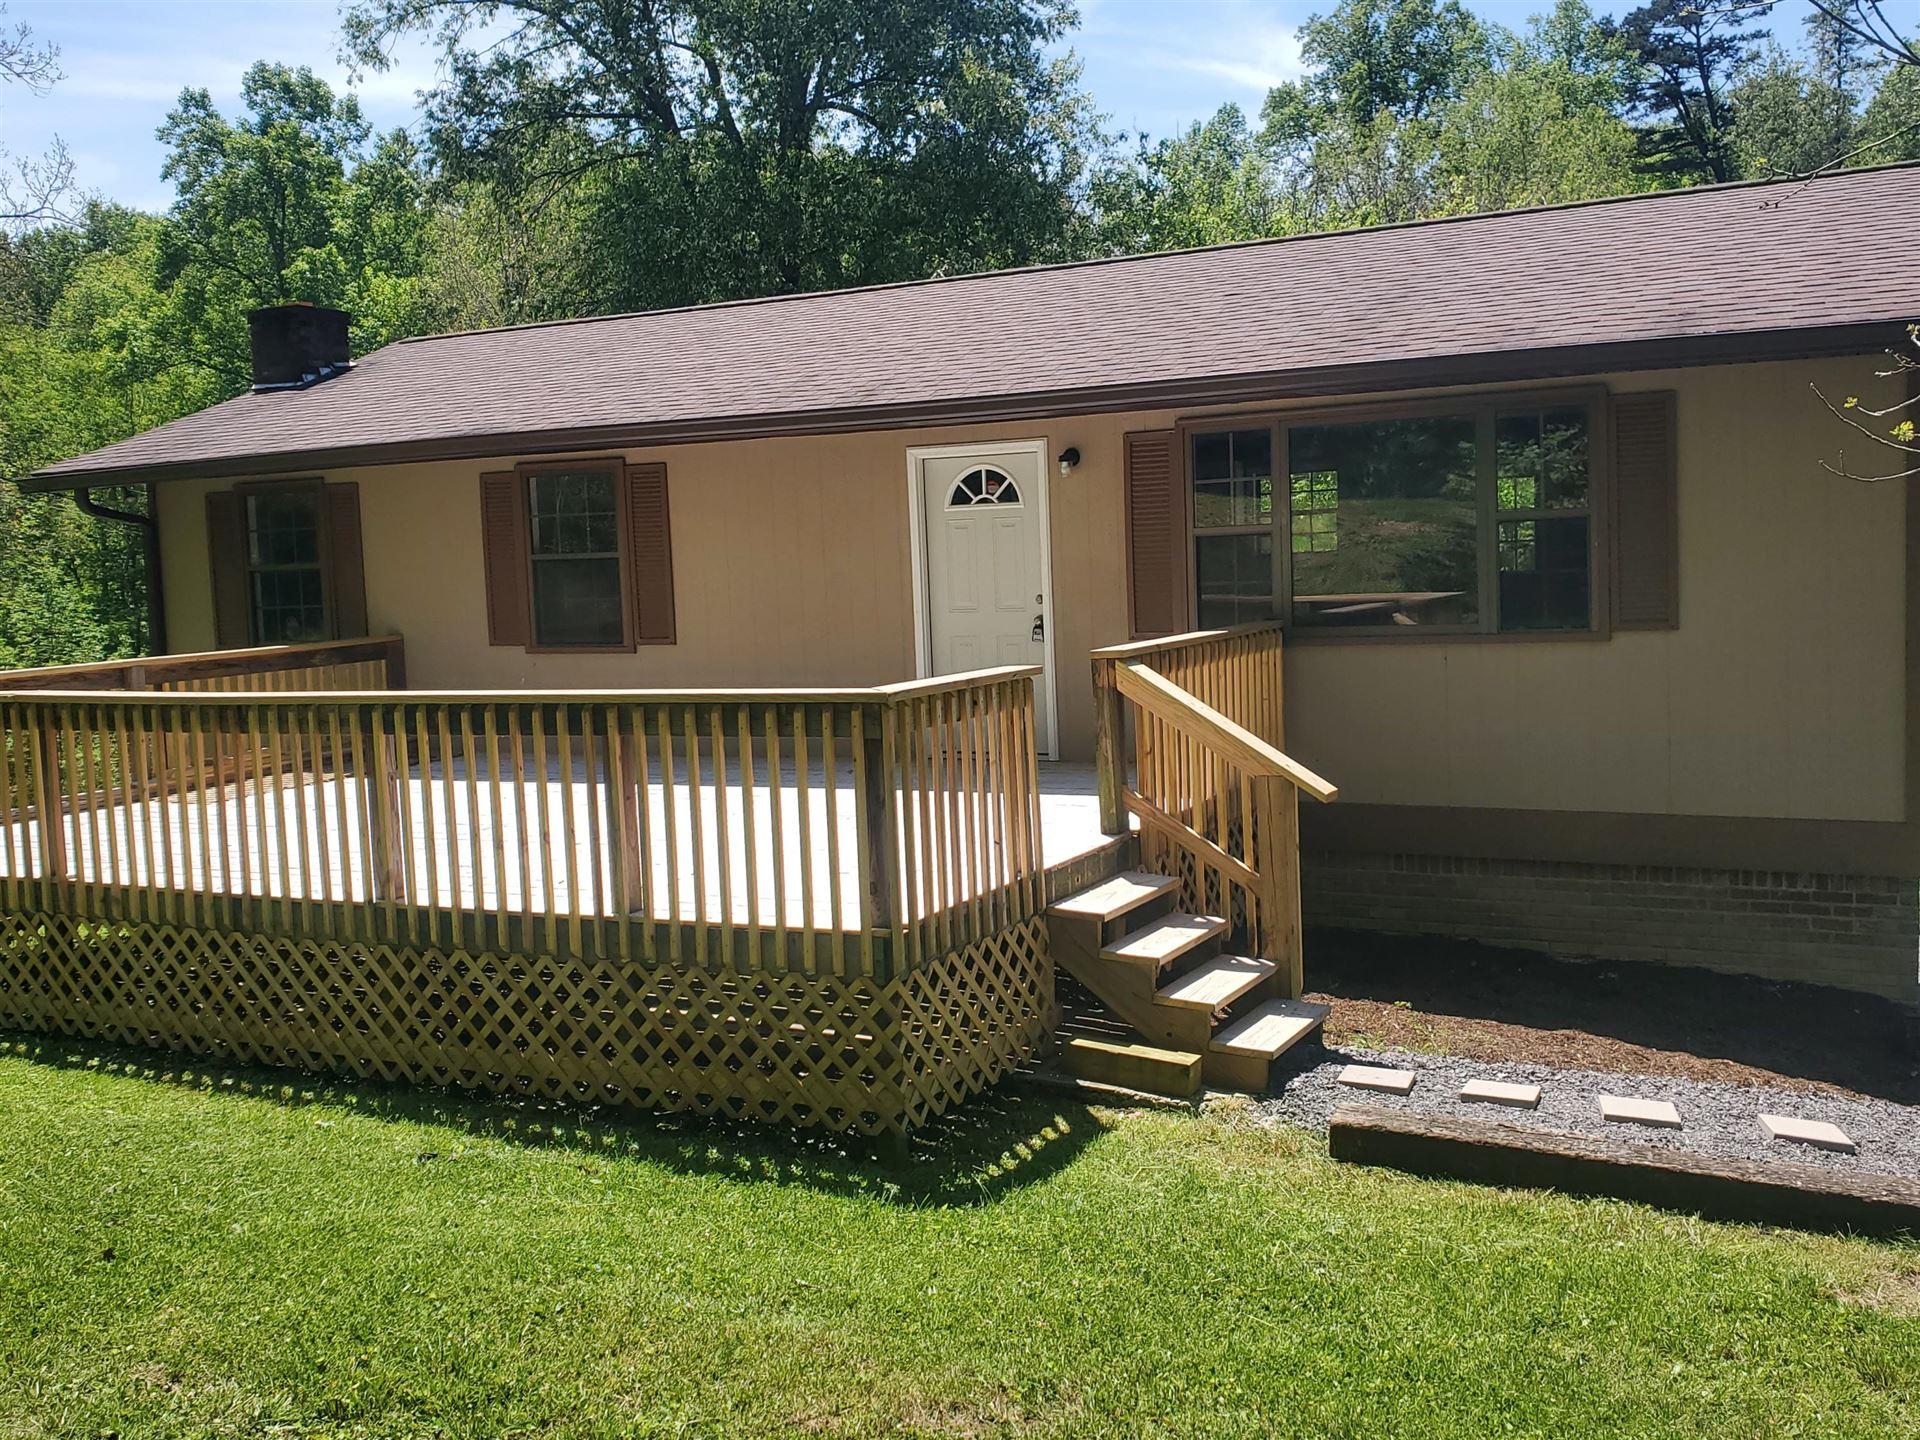 Photo of 651 Harmon Rd, New Tazewell, TN 37825 (MLS # 1152508)